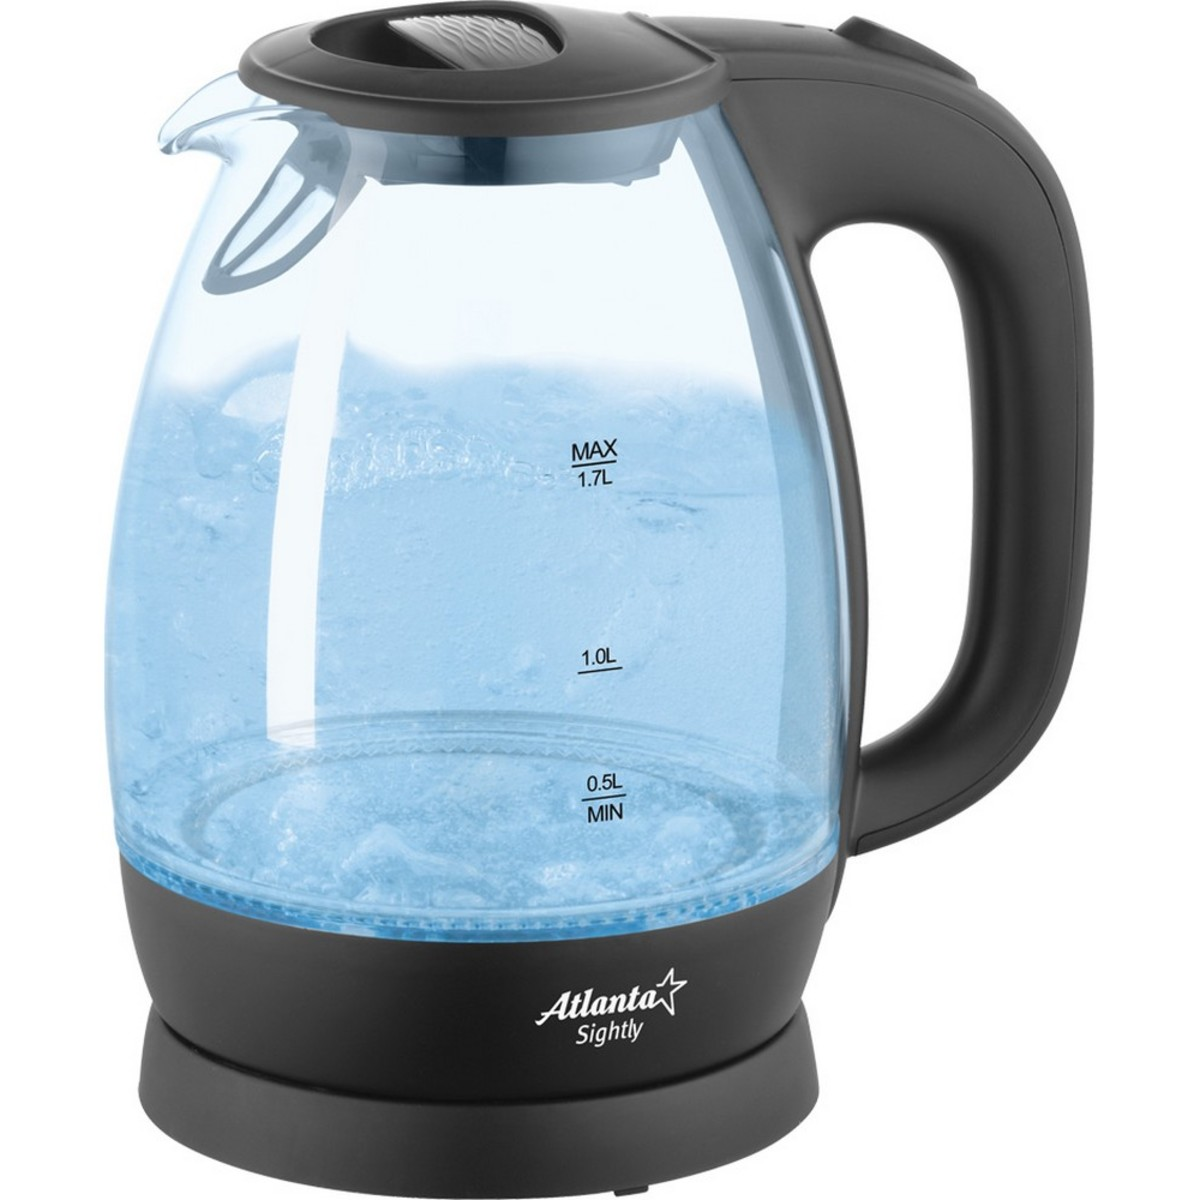 Электрический чайник ATLANTA ATH-2465 (black) 1.5 л